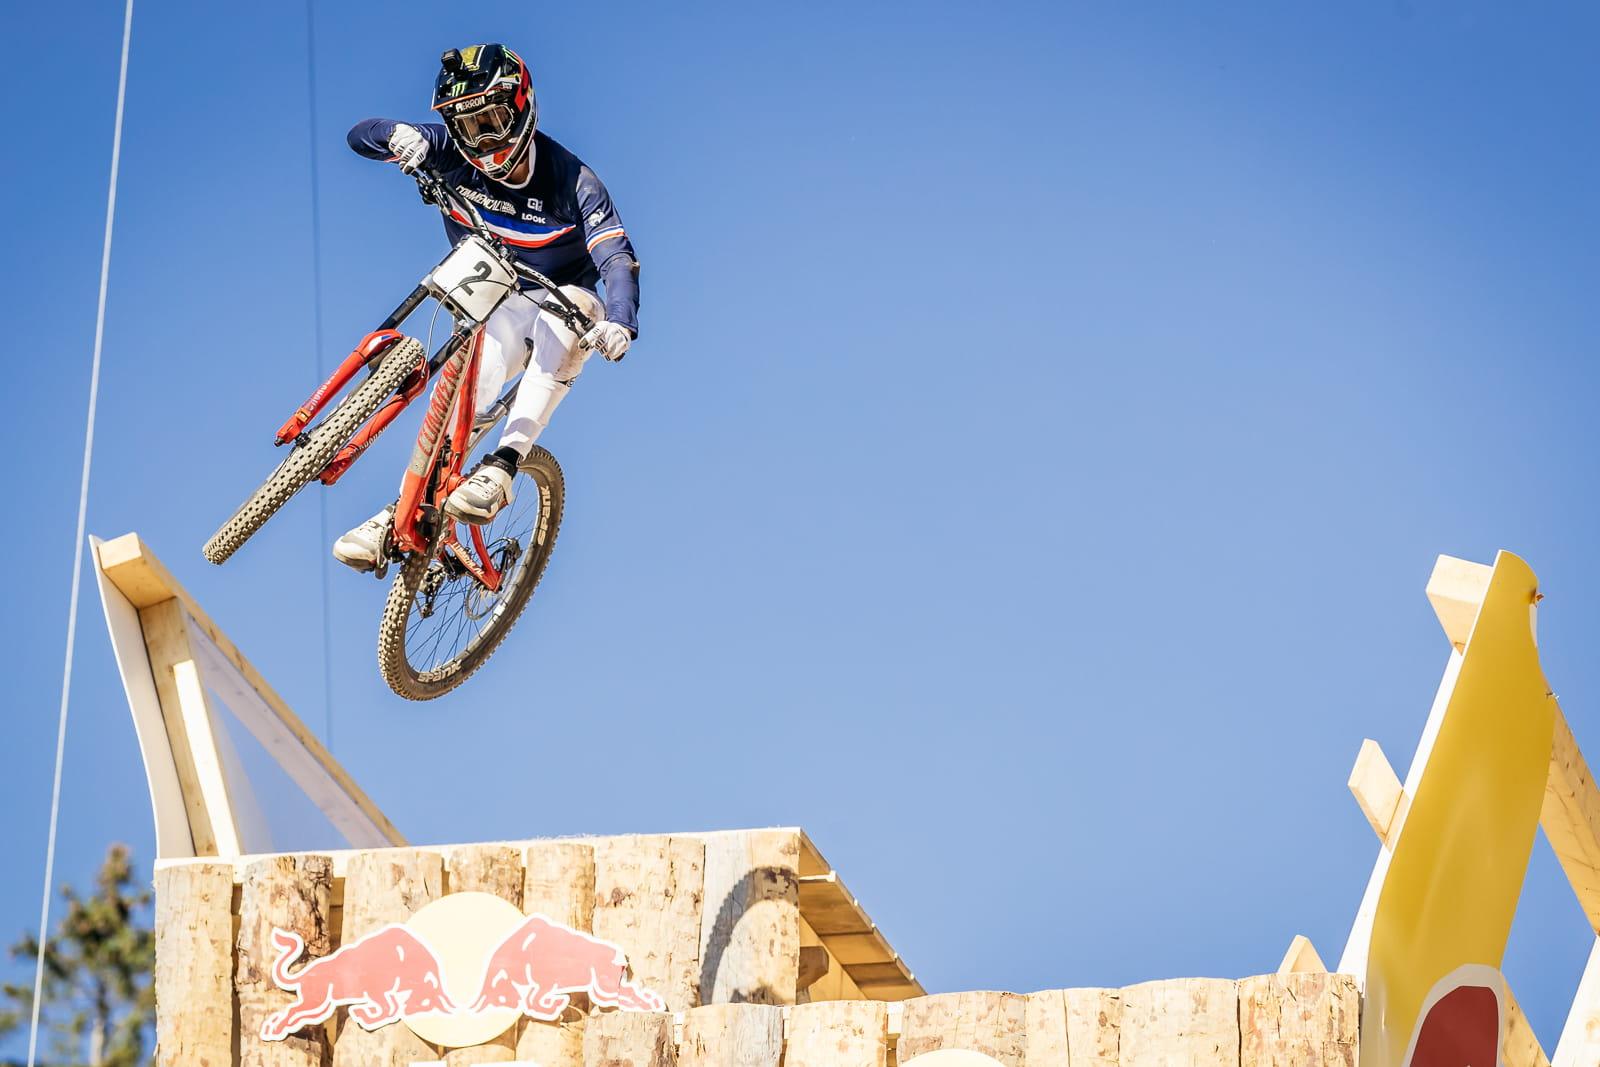 DH_PIERRON-Amaury_Downhill_Elite_Men_WM_by_Piotr_Staron-IMG_7555